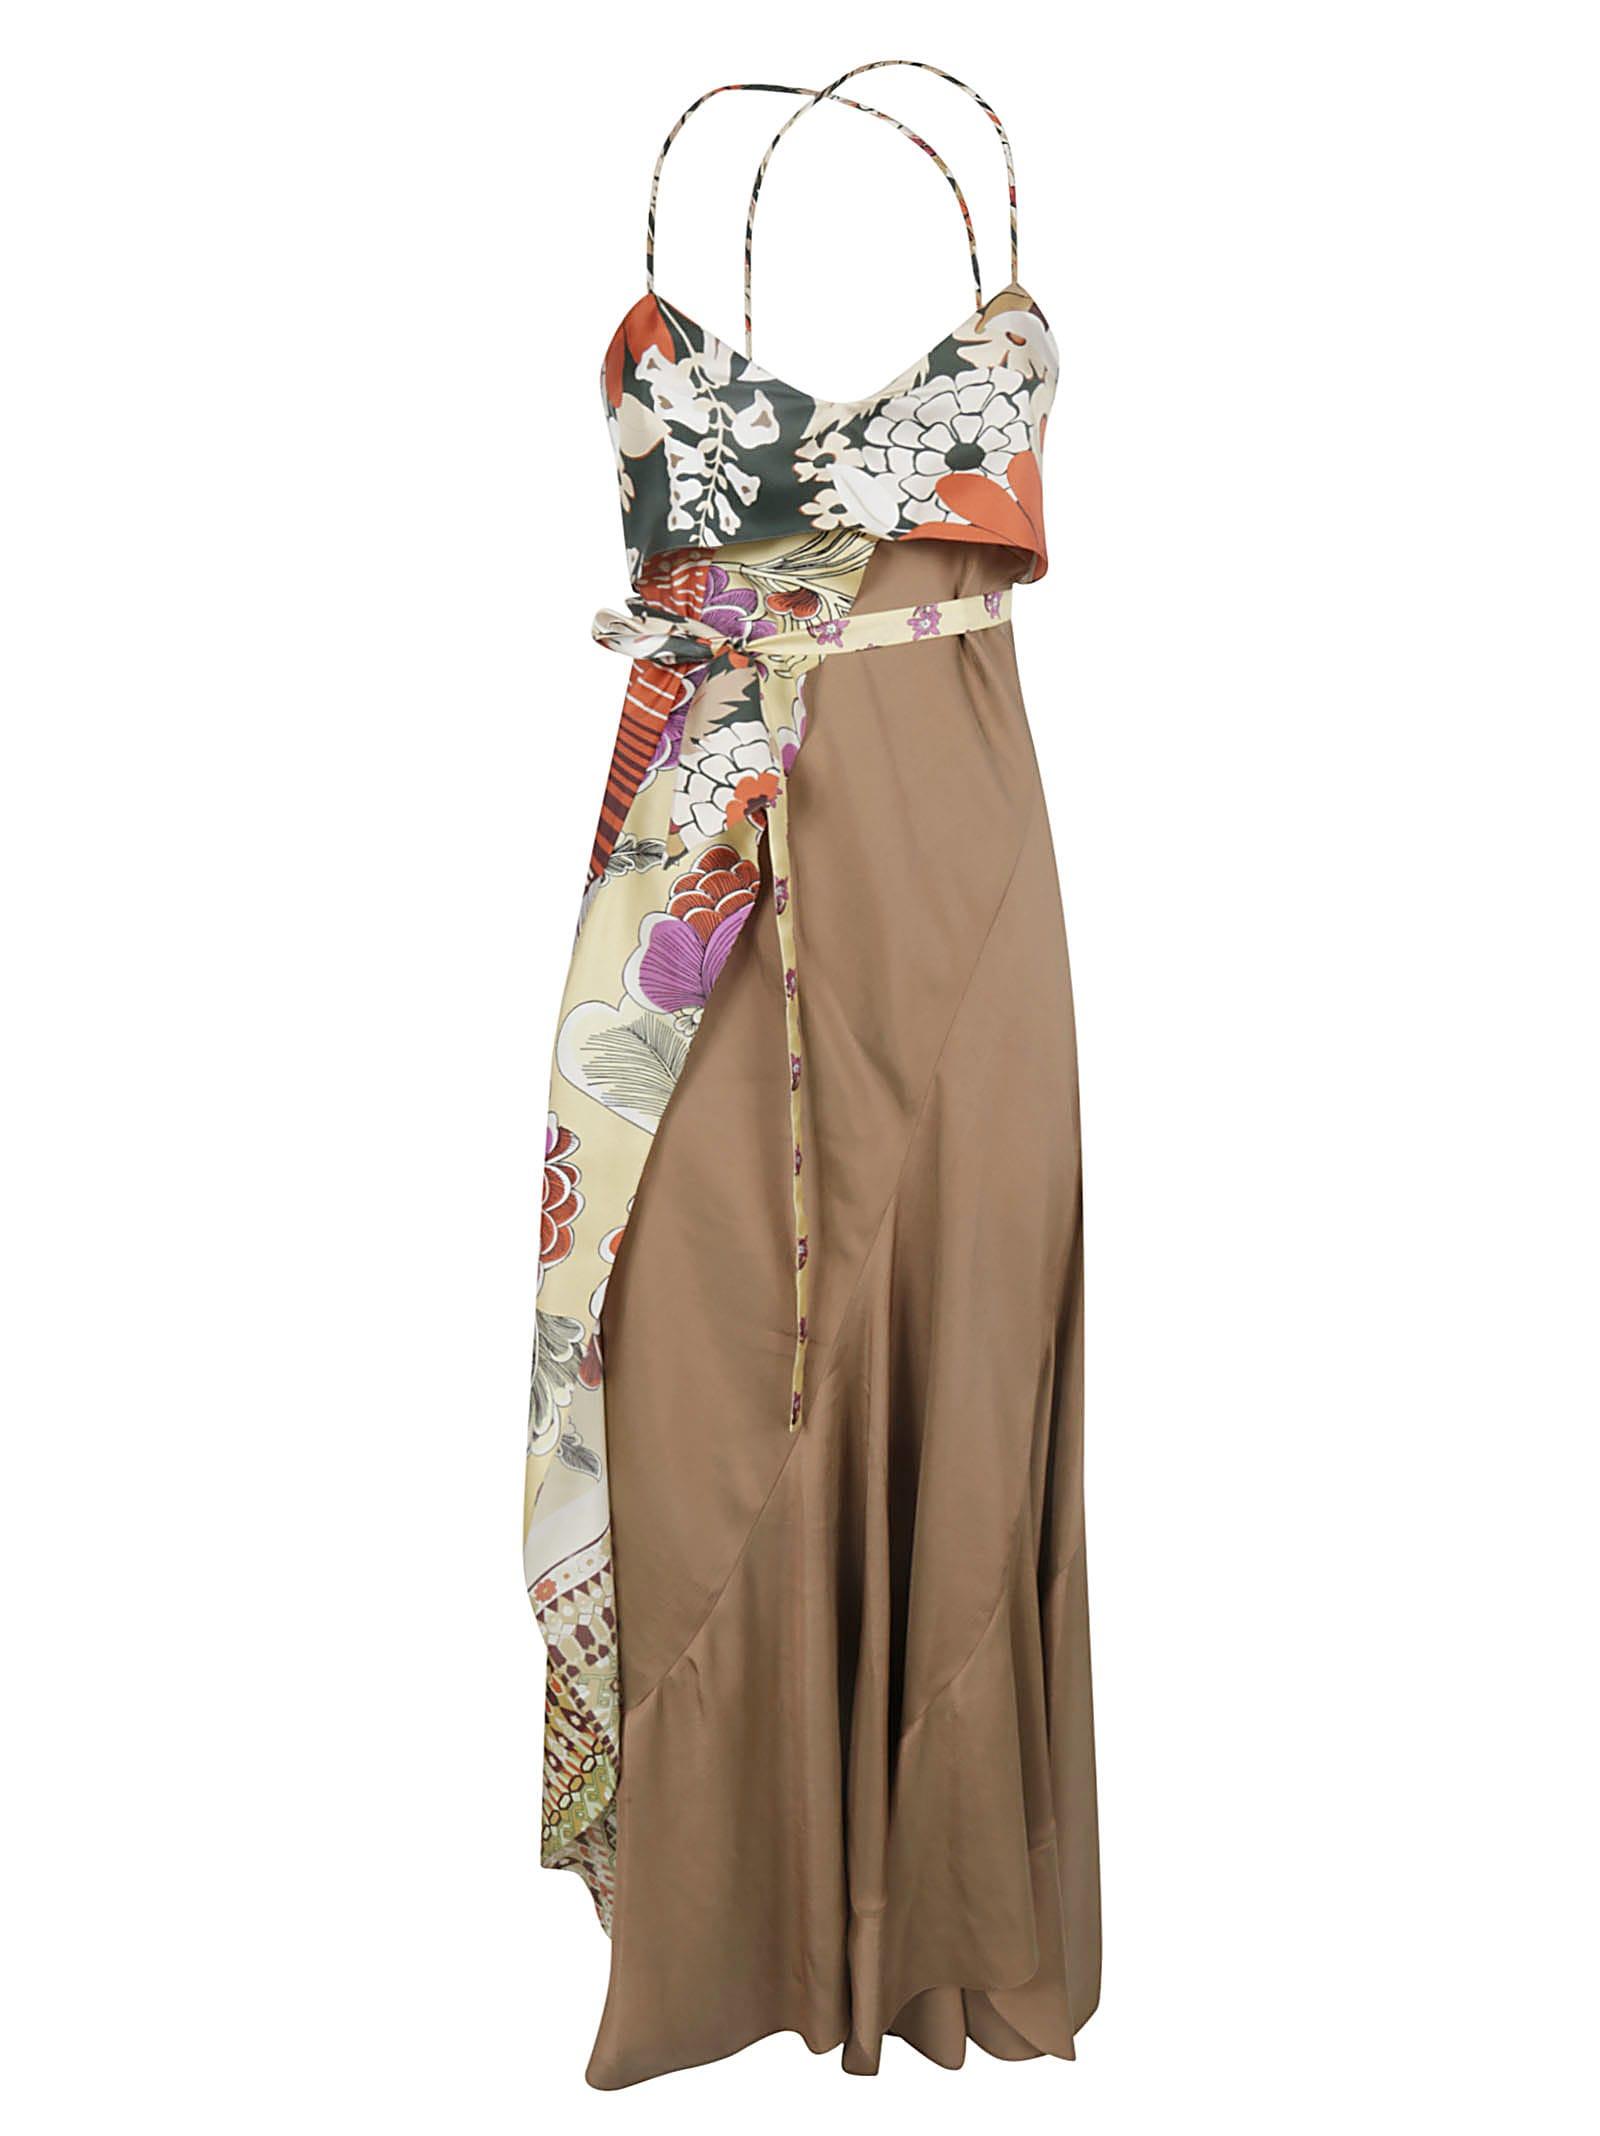 Chloé Scarf Detail Dress